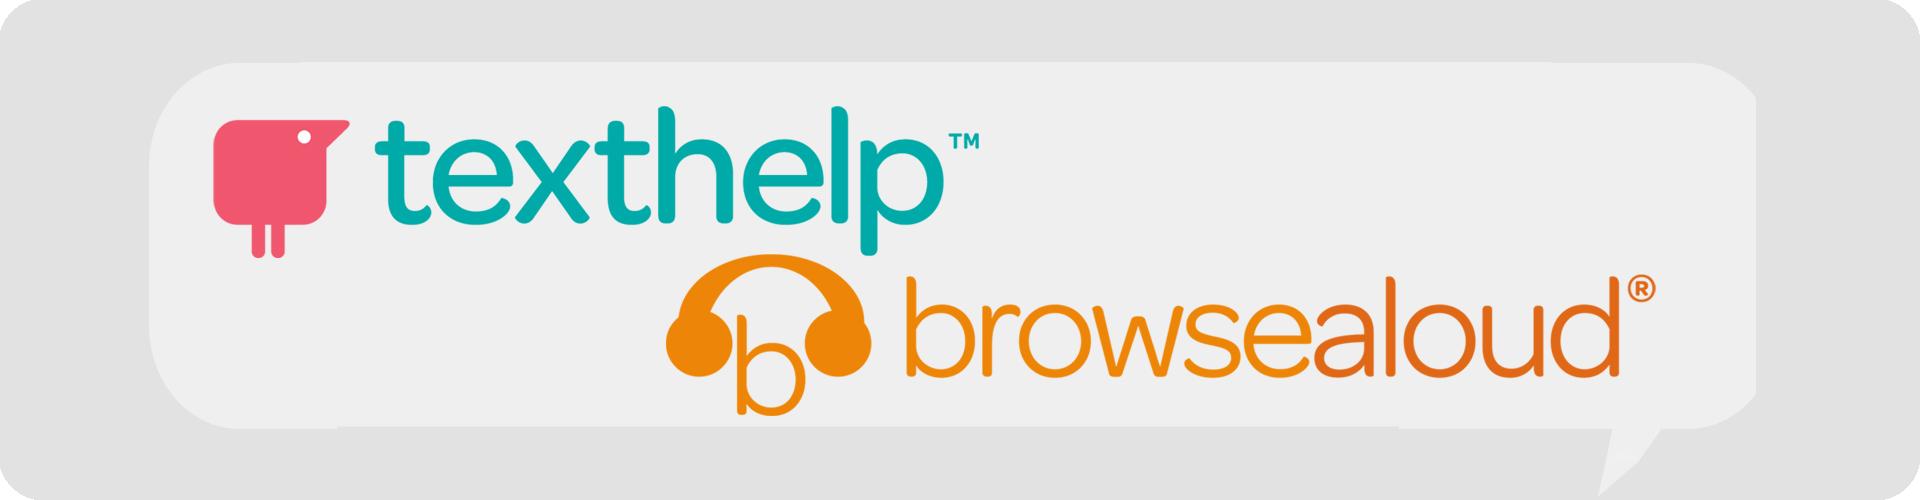 texthelp and browsealoud logo